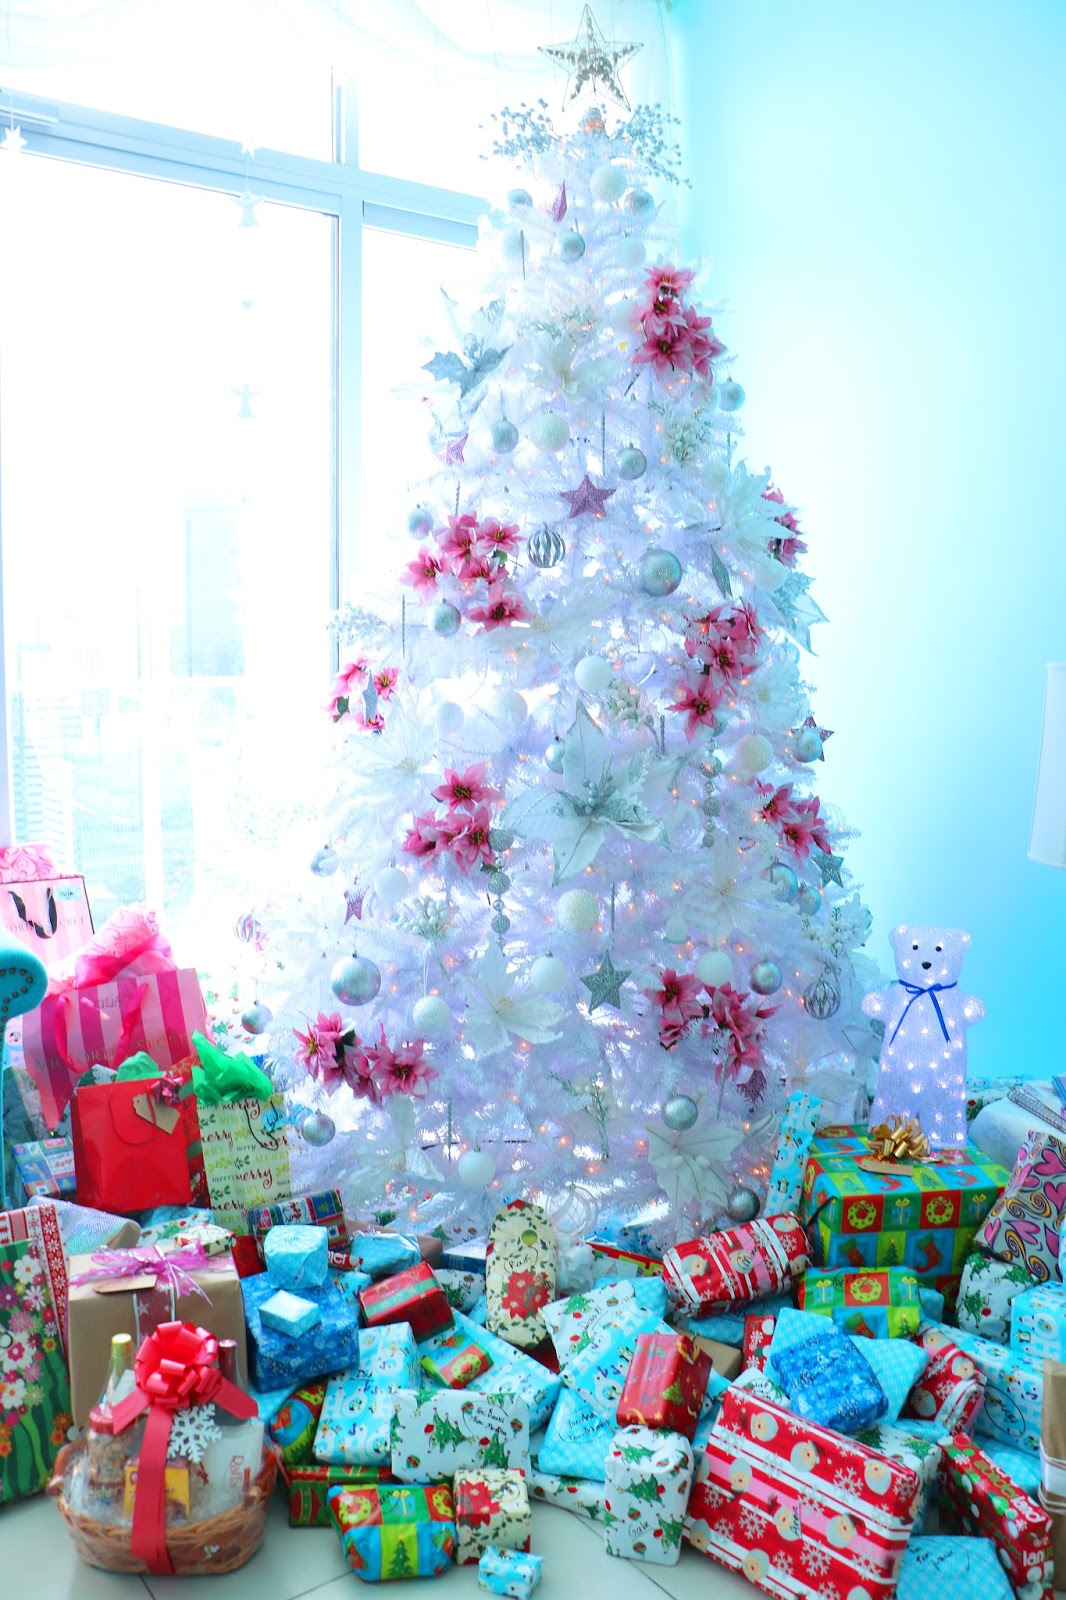 A magical Christmas Morning